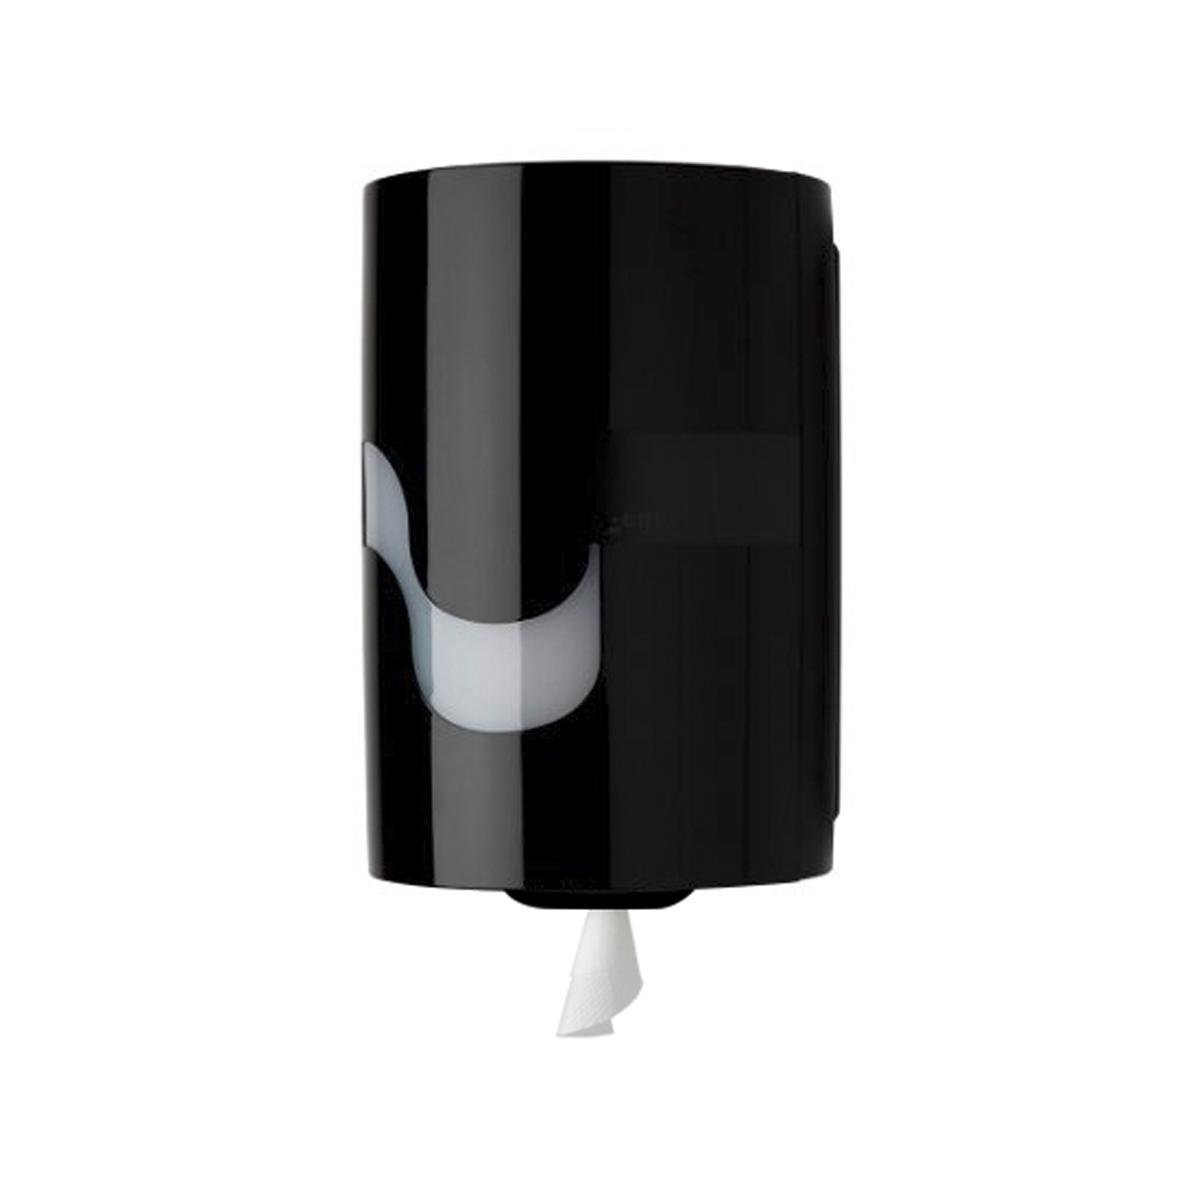 Handtuchrollenspender midi perfo Box schwarz